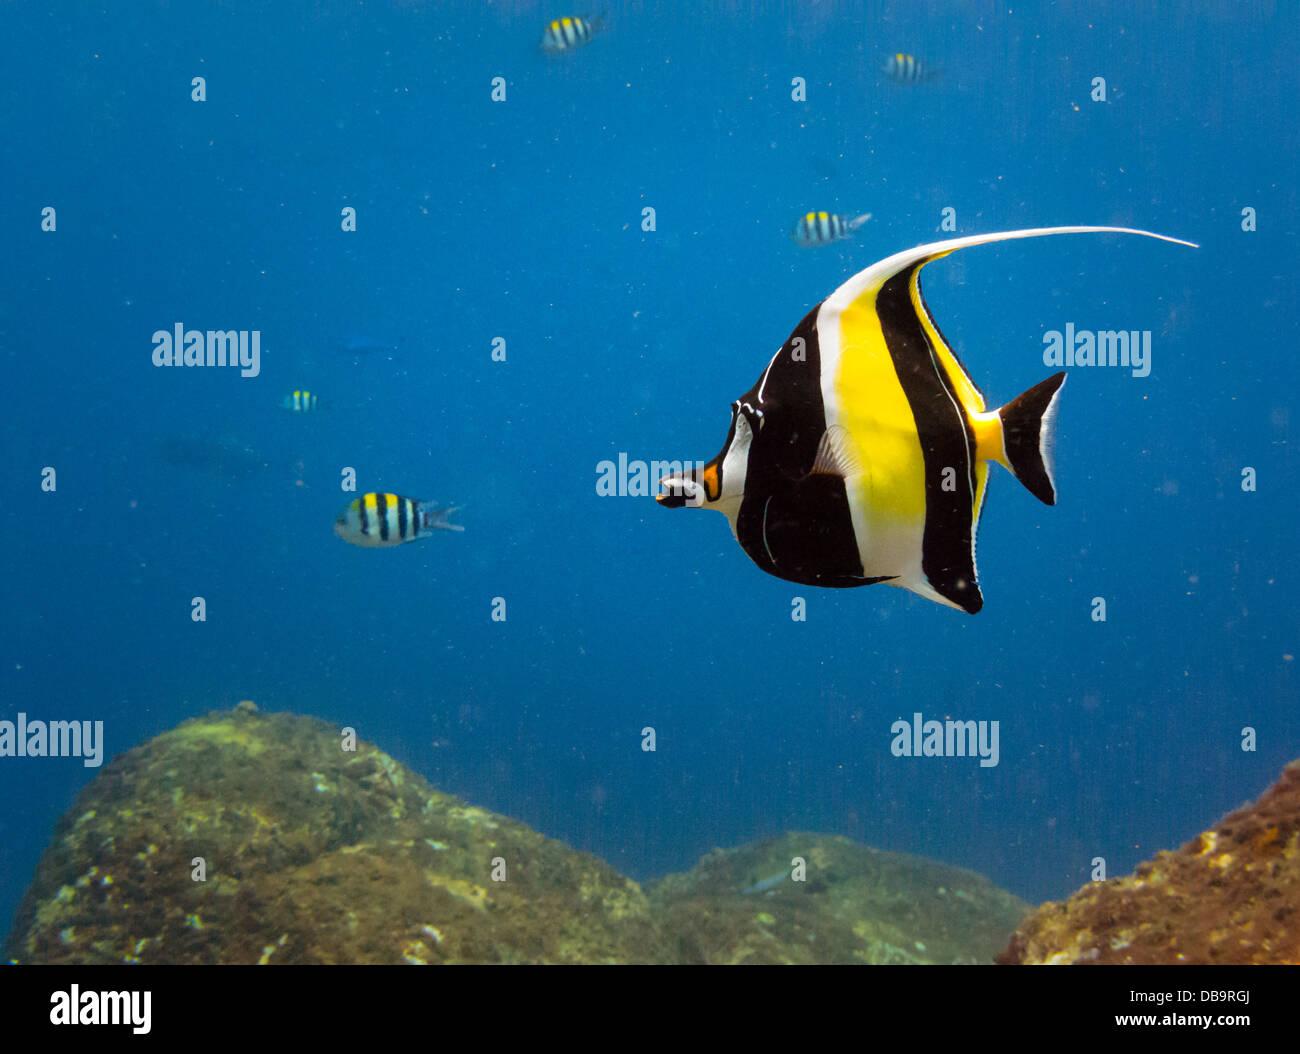 Close Up Of Brilliant Yellow Black White Striped